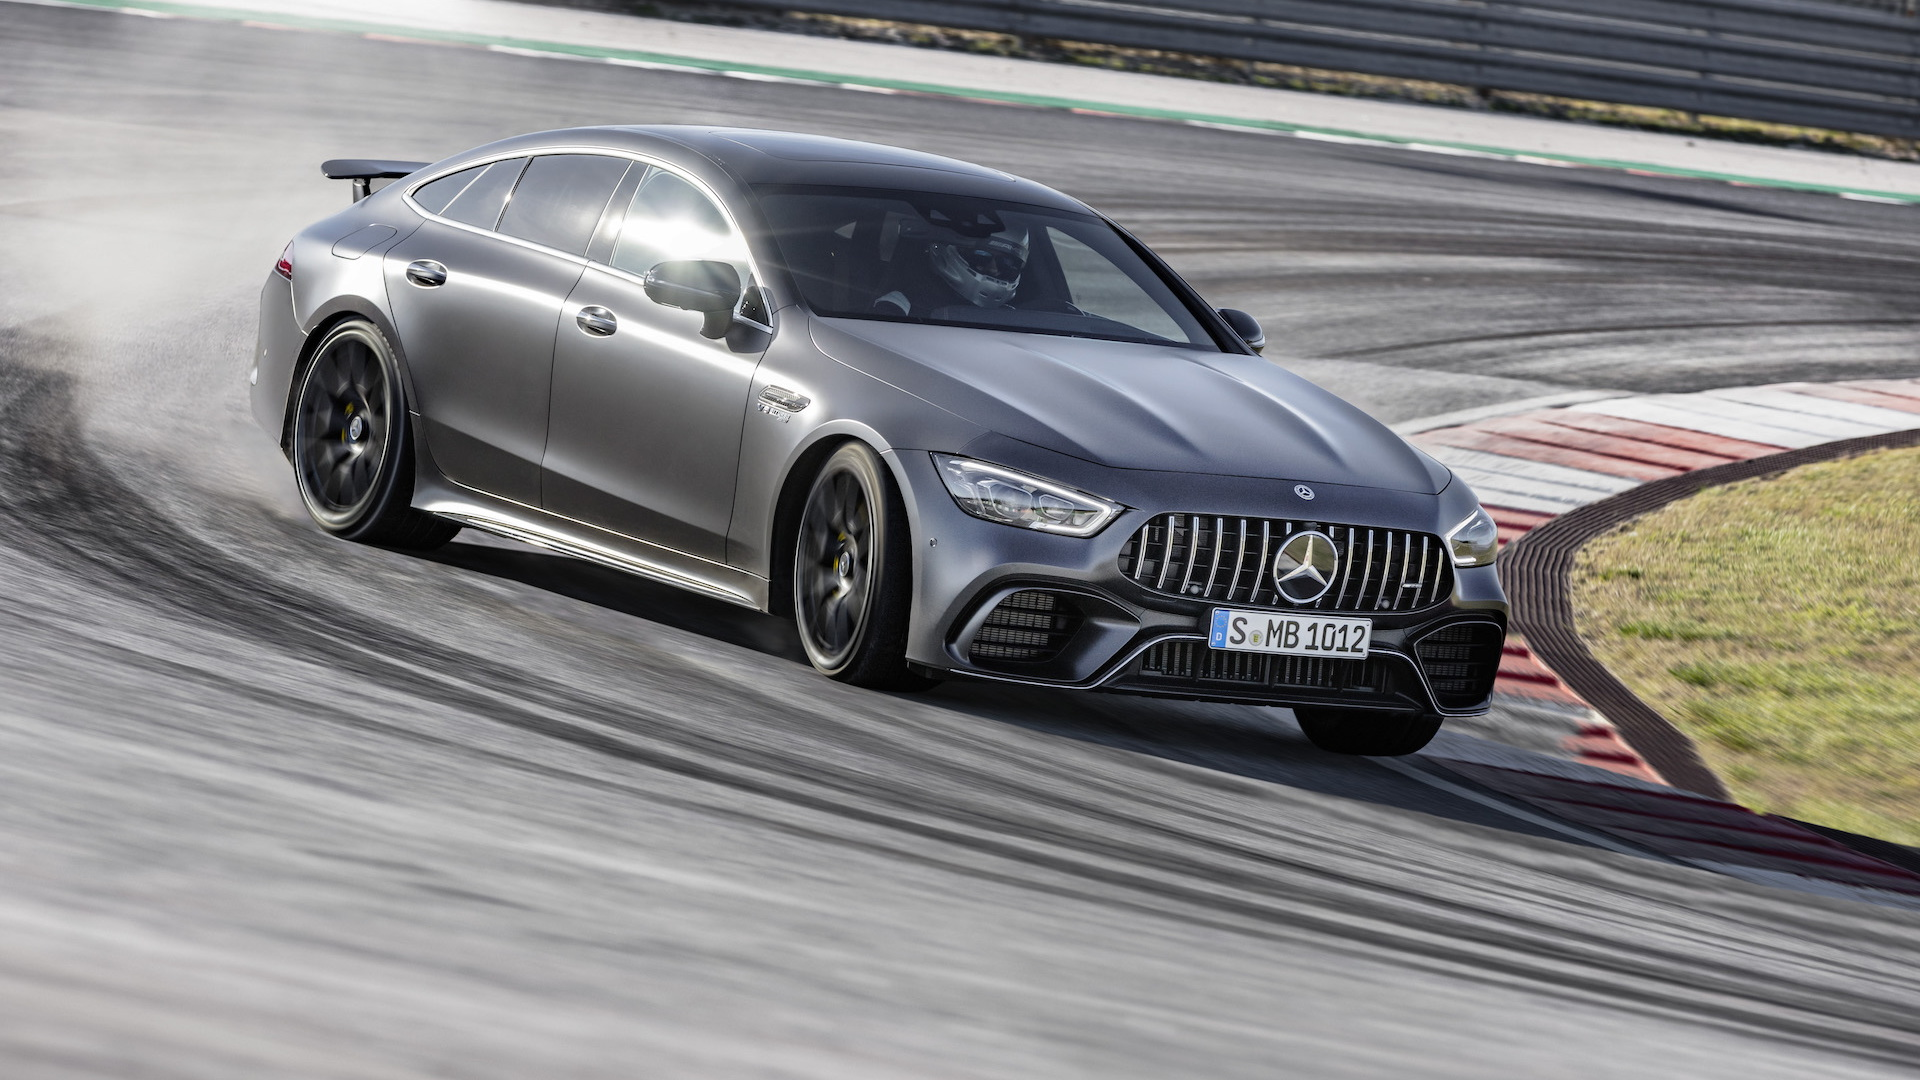 Mercedes Benz Amg Gt News Breaking News Photos Videos Motor